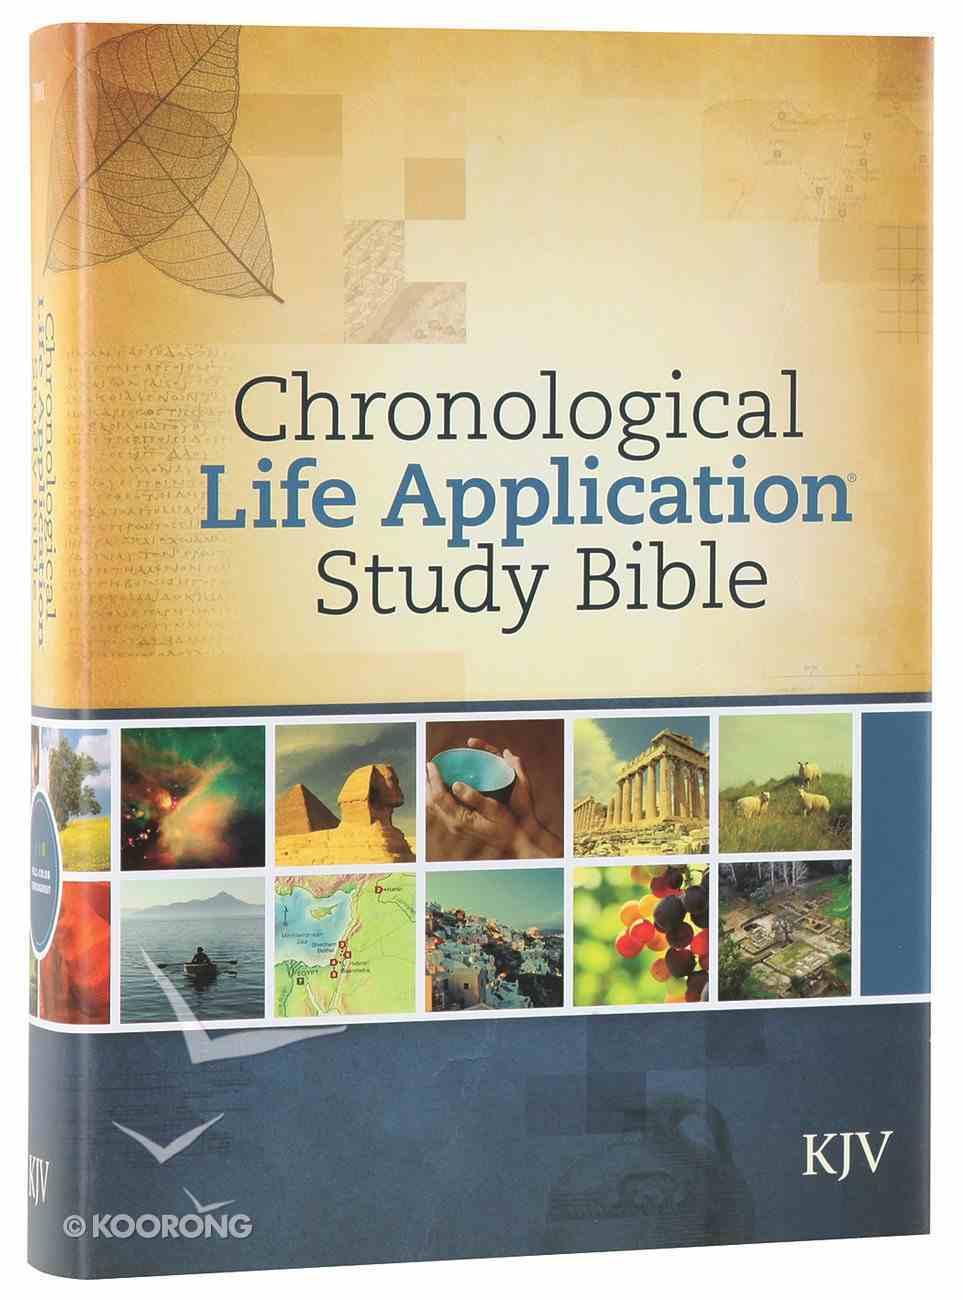 9781414380582 980984@2x - Chronological Life Application Study Bible Kjv Pdf